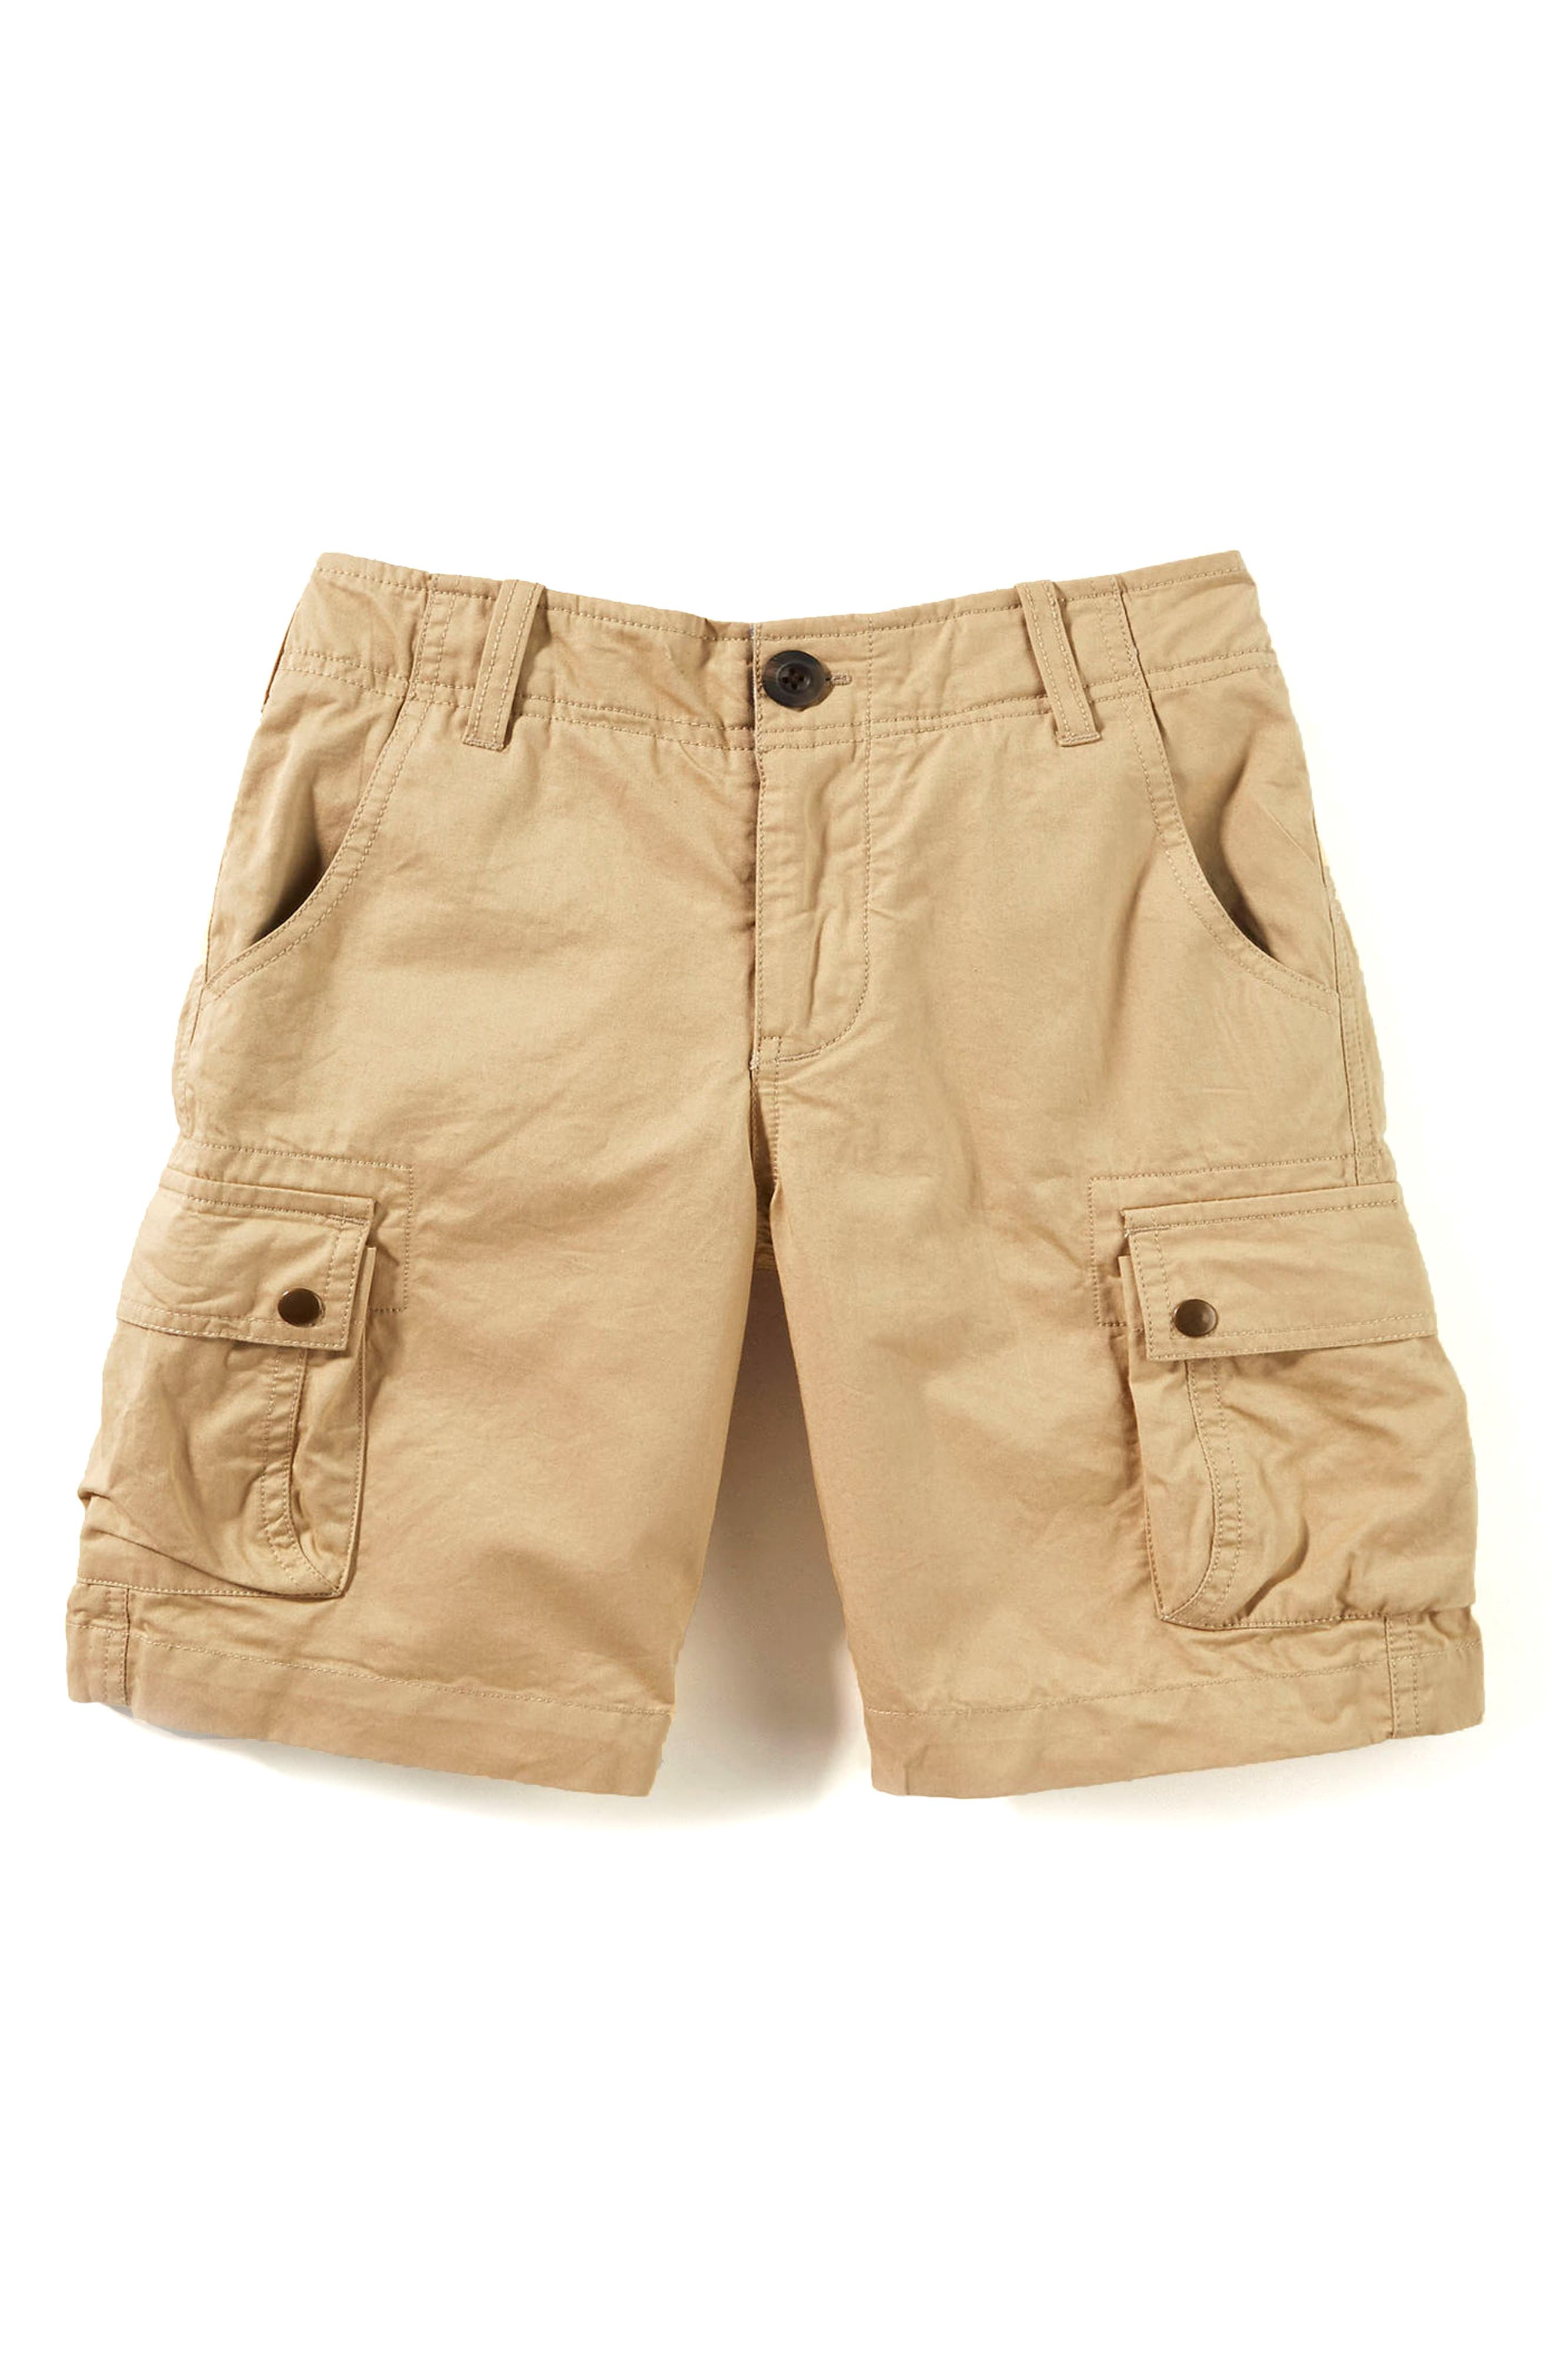 Cargo Shorts,                             Main thumbnail 1, color,                             Khaki